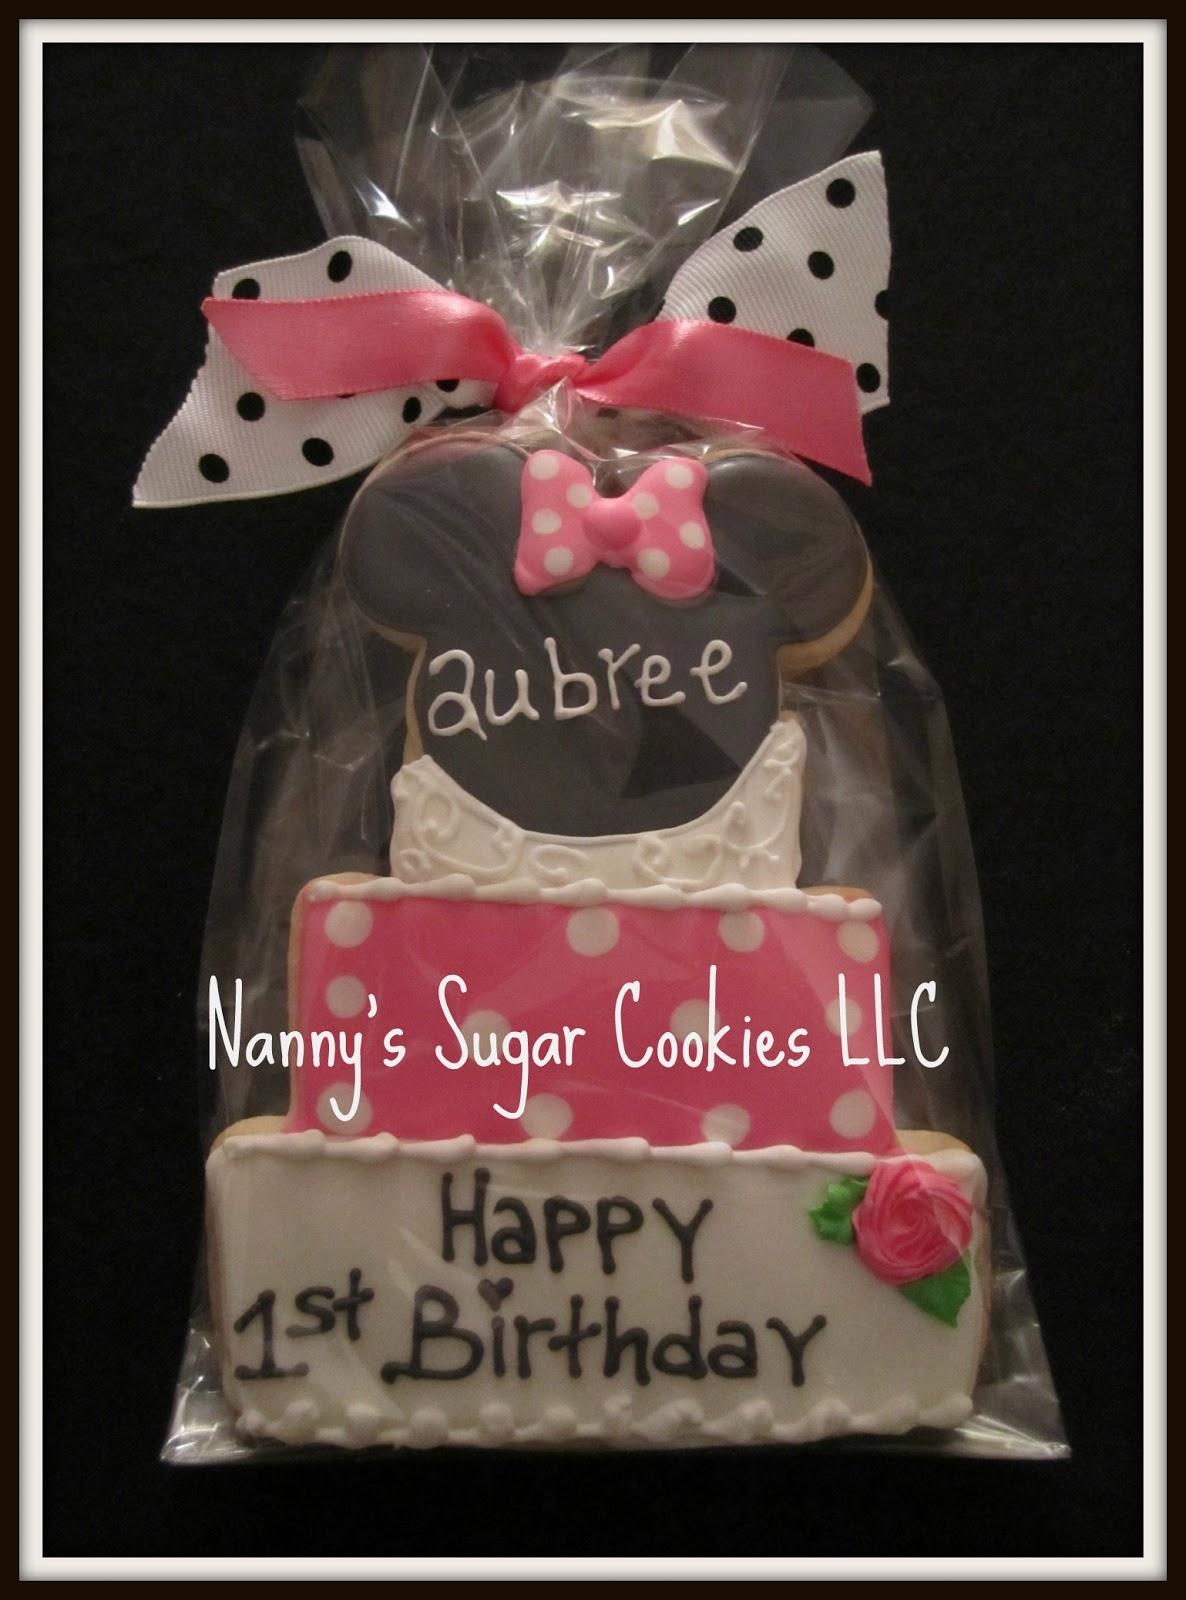 Nannys Sugar Cookies LLC: Happy Birthday